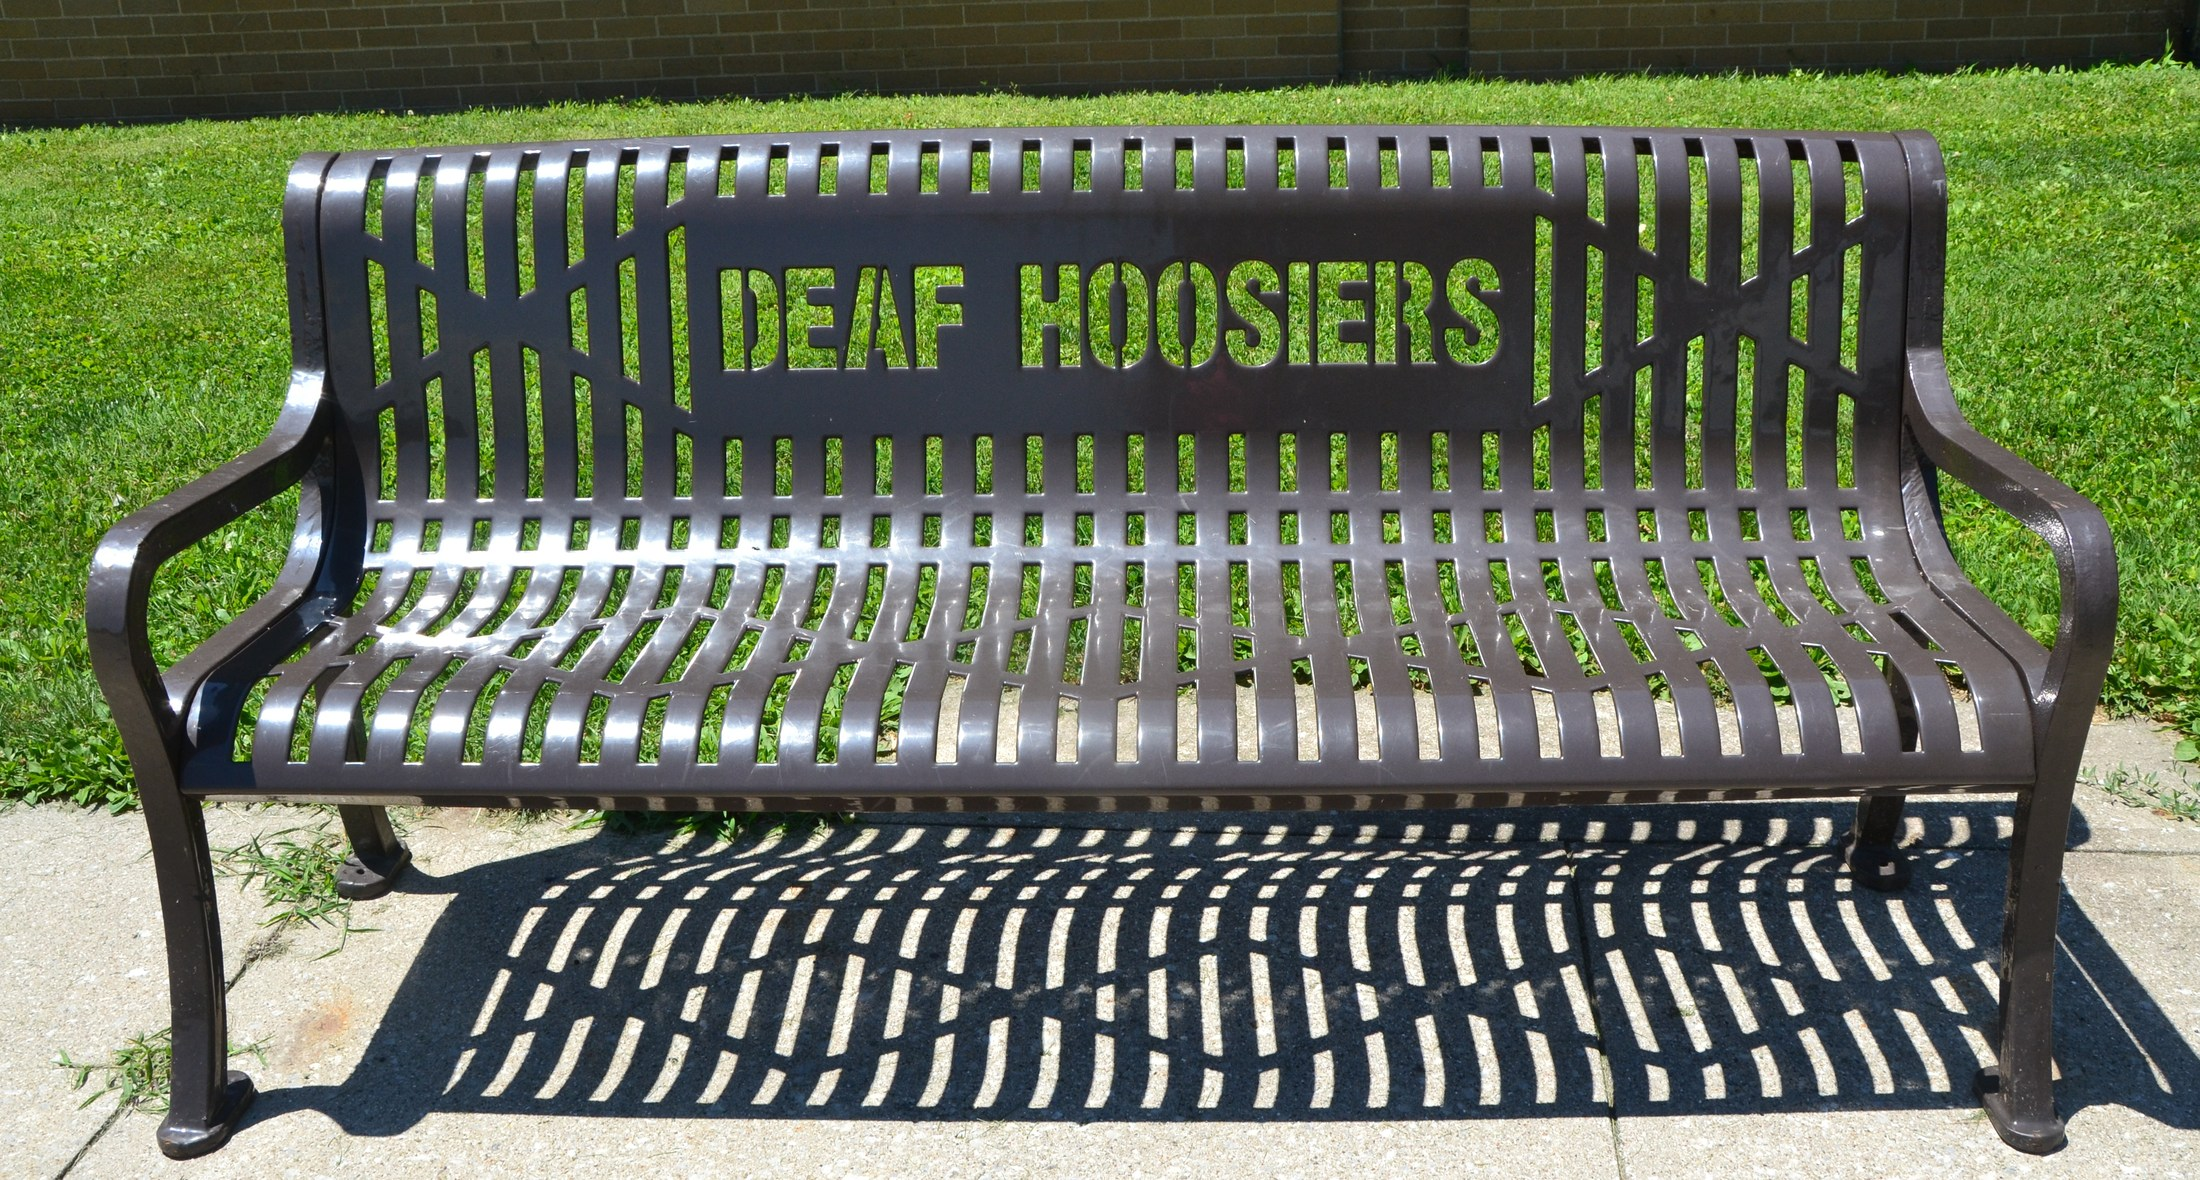 Deaf Hoosiers Bench